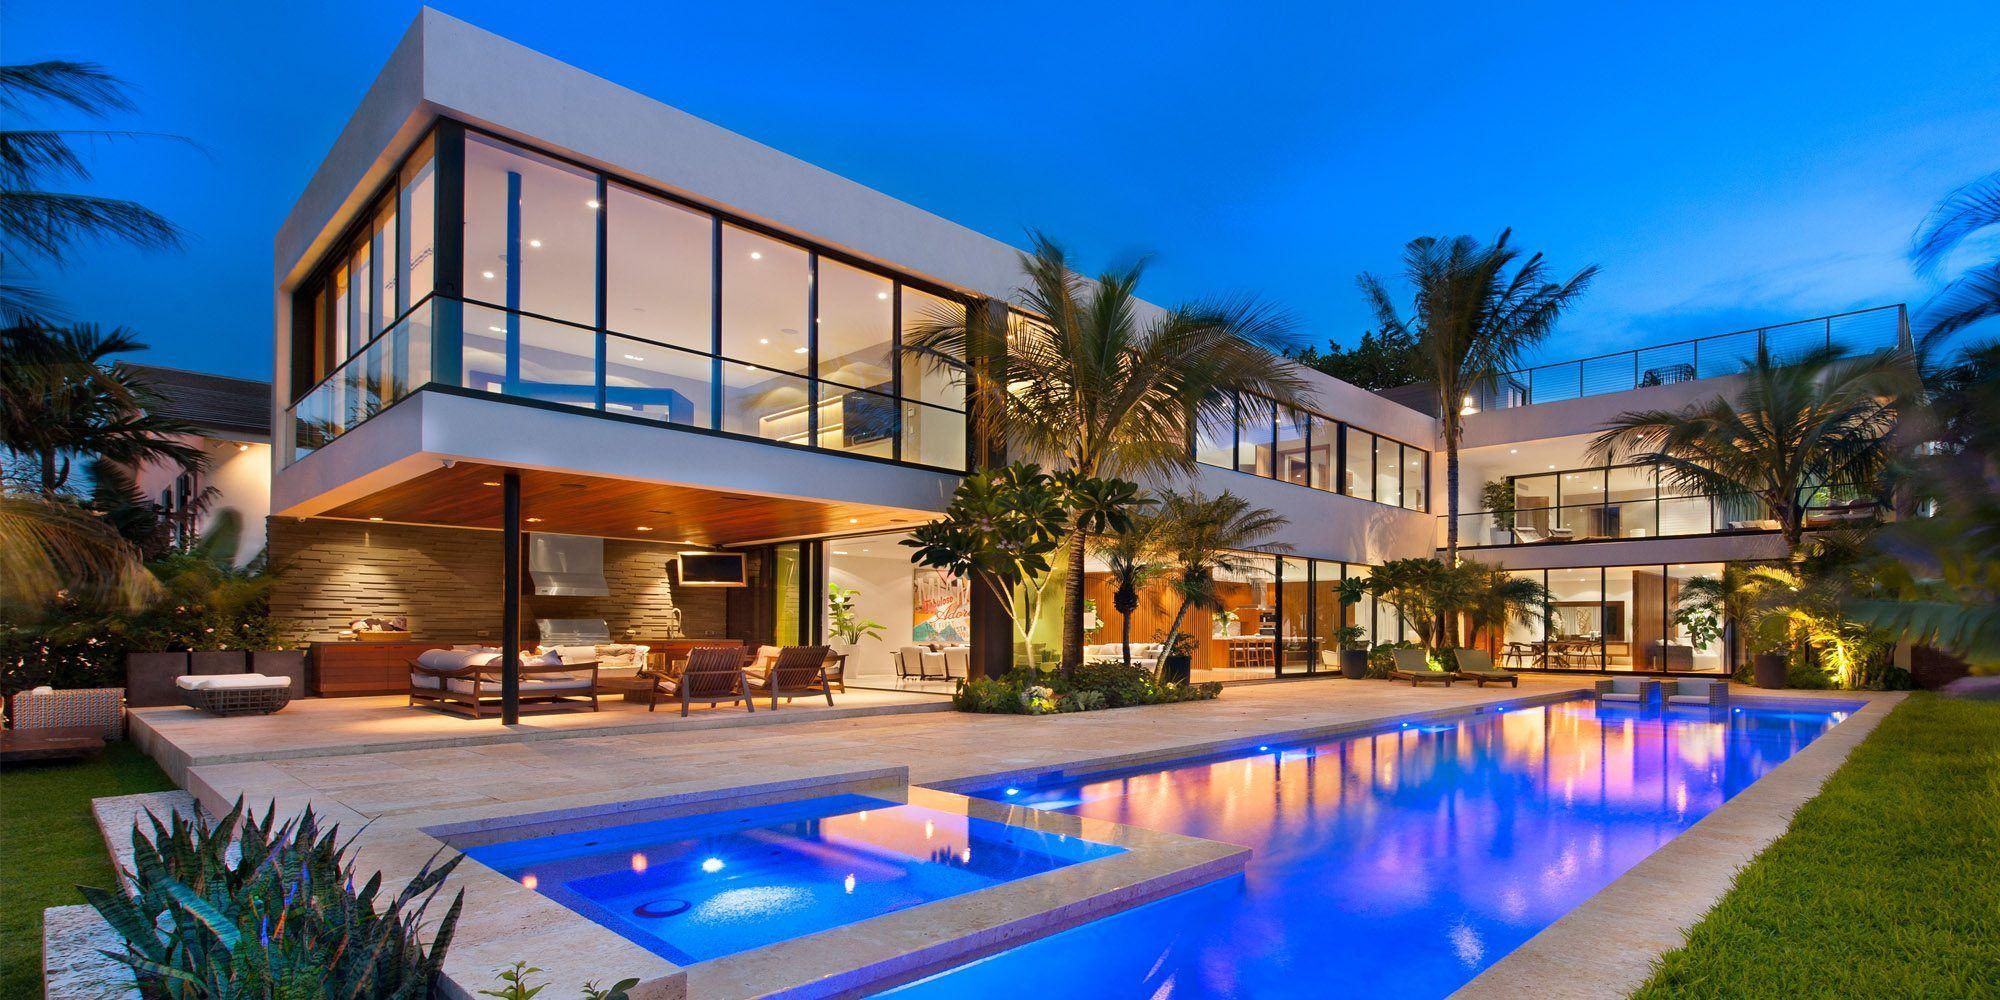 Miami Miami Beach Mansions 2020 Luxury Homes